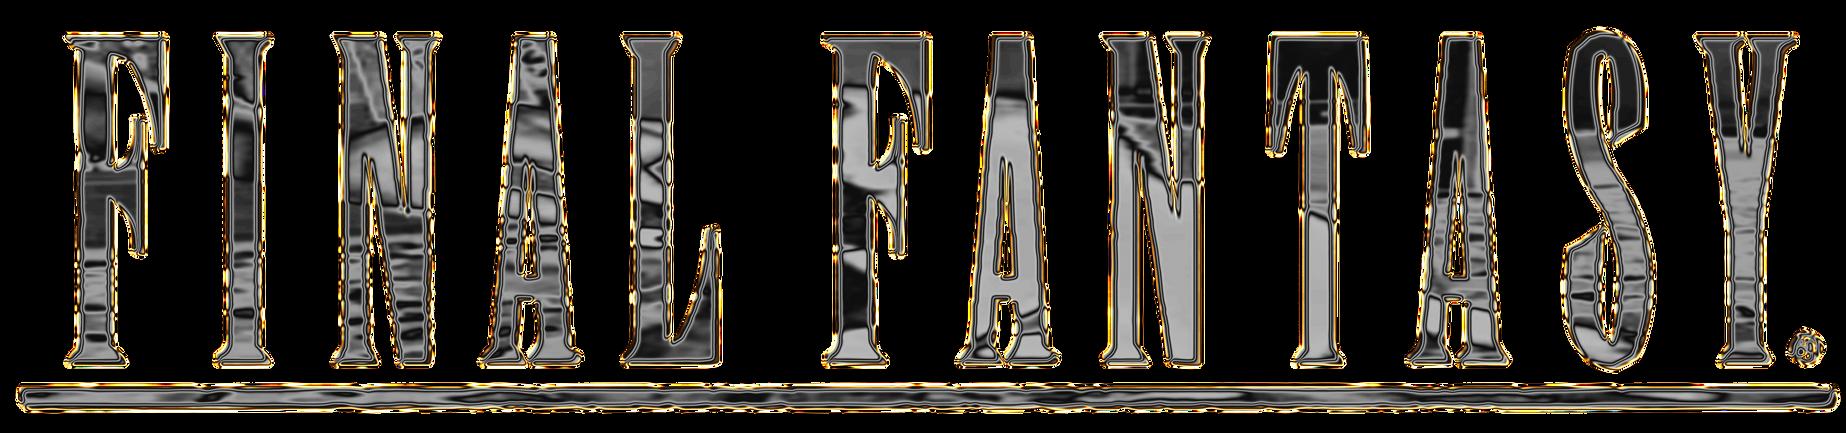 final fantasy xii logo png